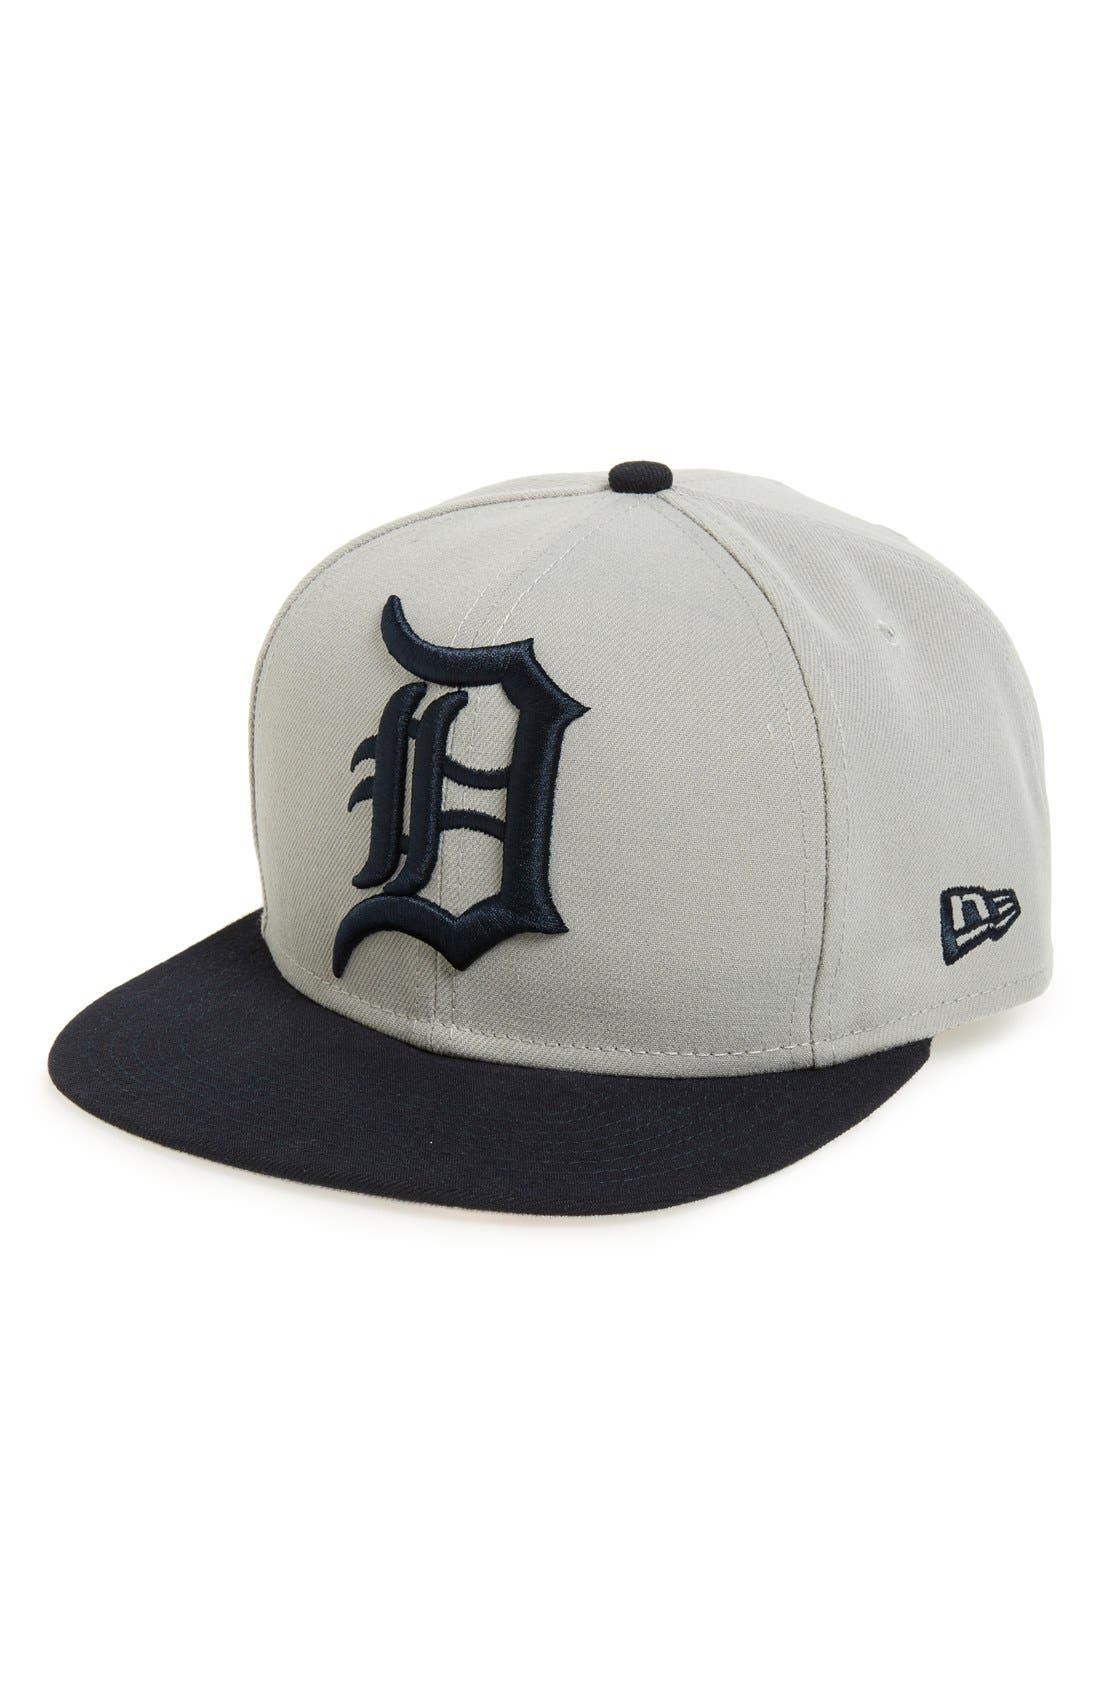 Main Image - New Era Cap 'Detroit Tigers' Snapback Cap